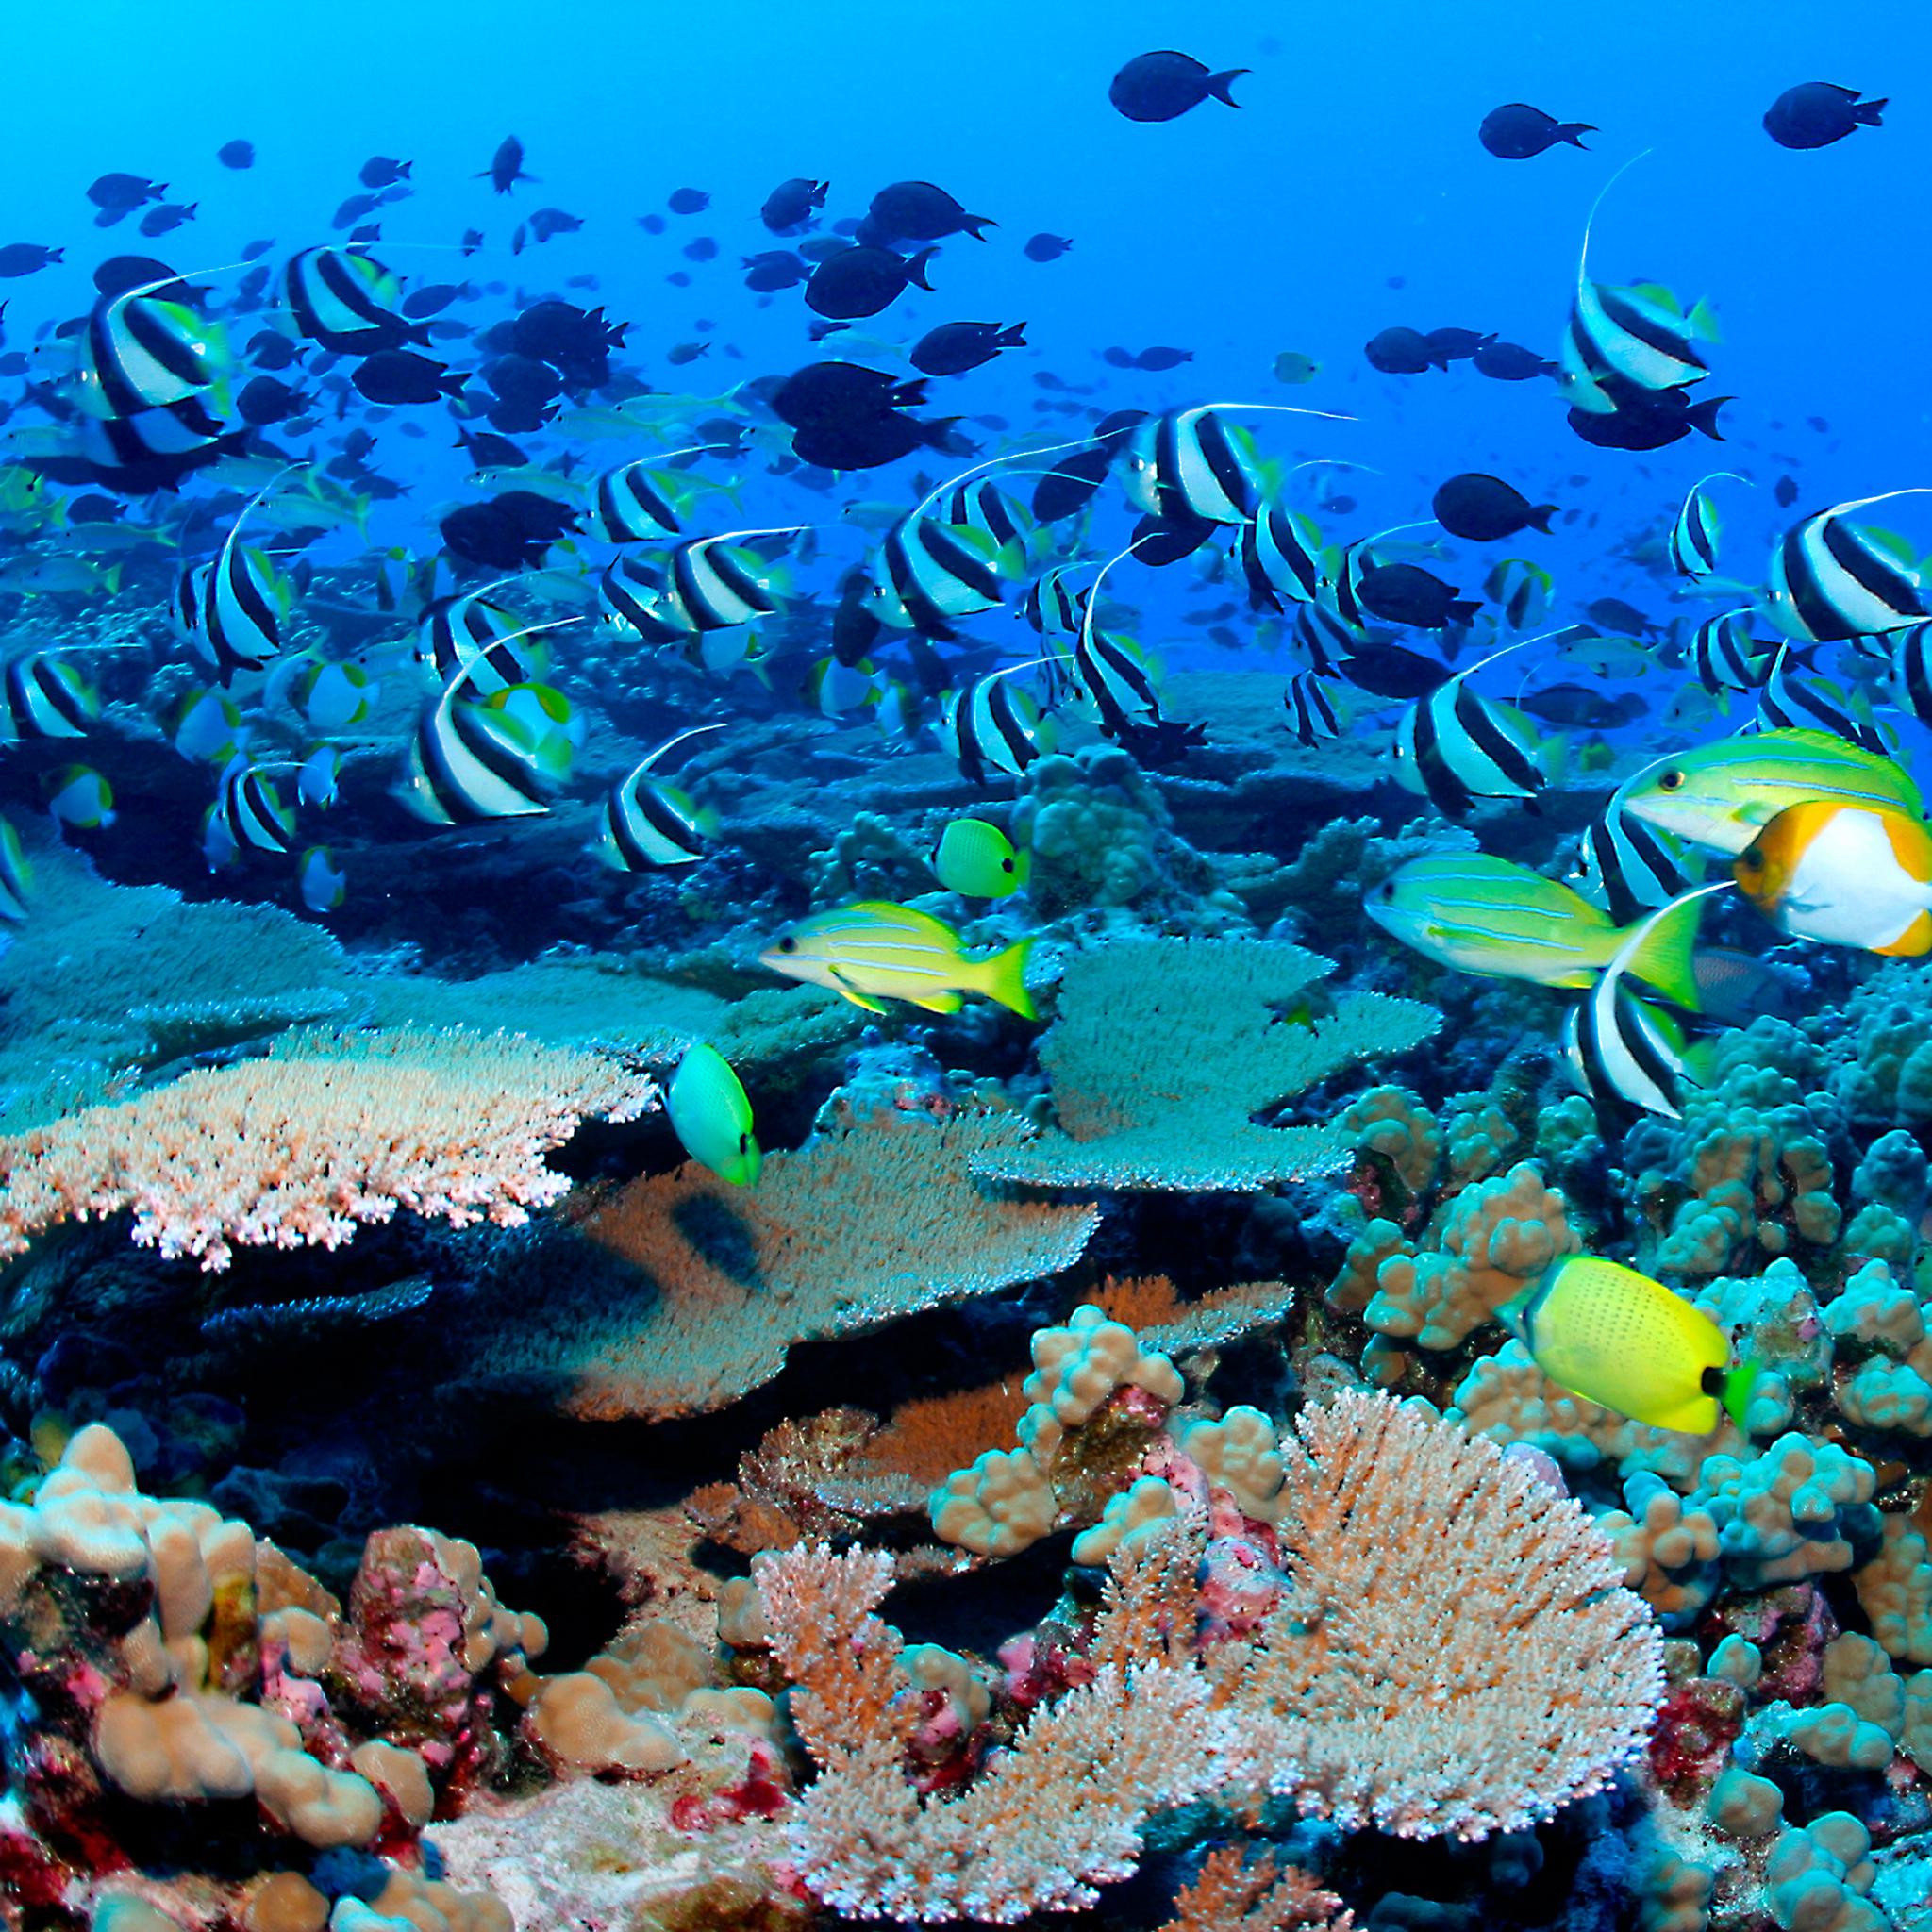 Fish-Under-The-Sea-3Wallpapers-iPad